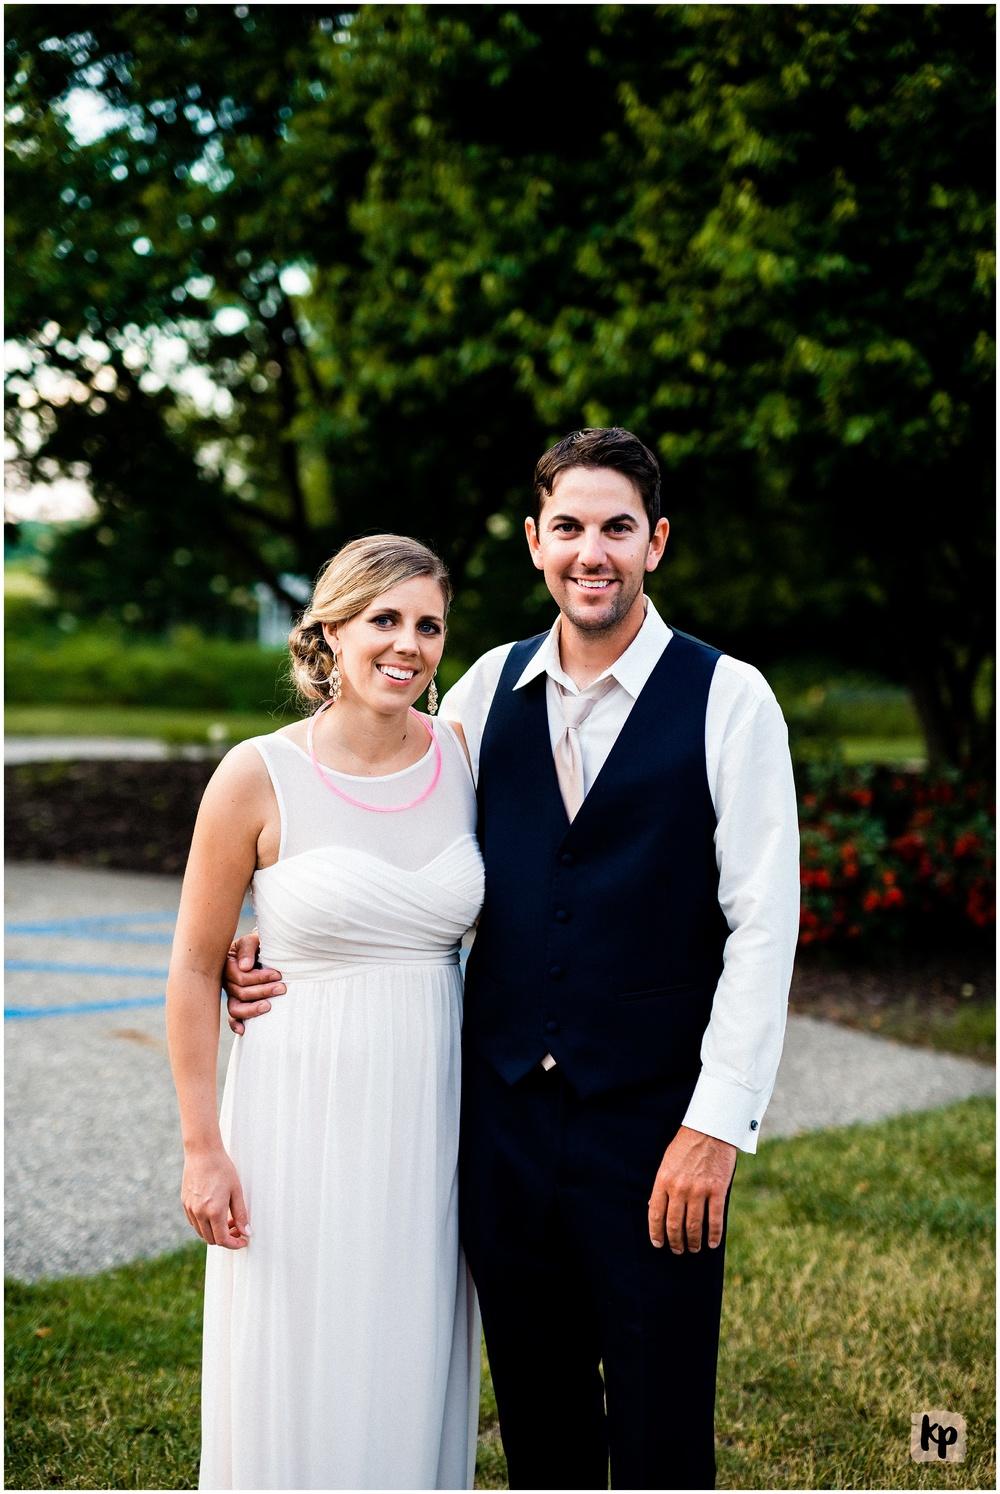 Matthieu + Katlyn | Just Married #kyleepaigephotography_0125.jpg